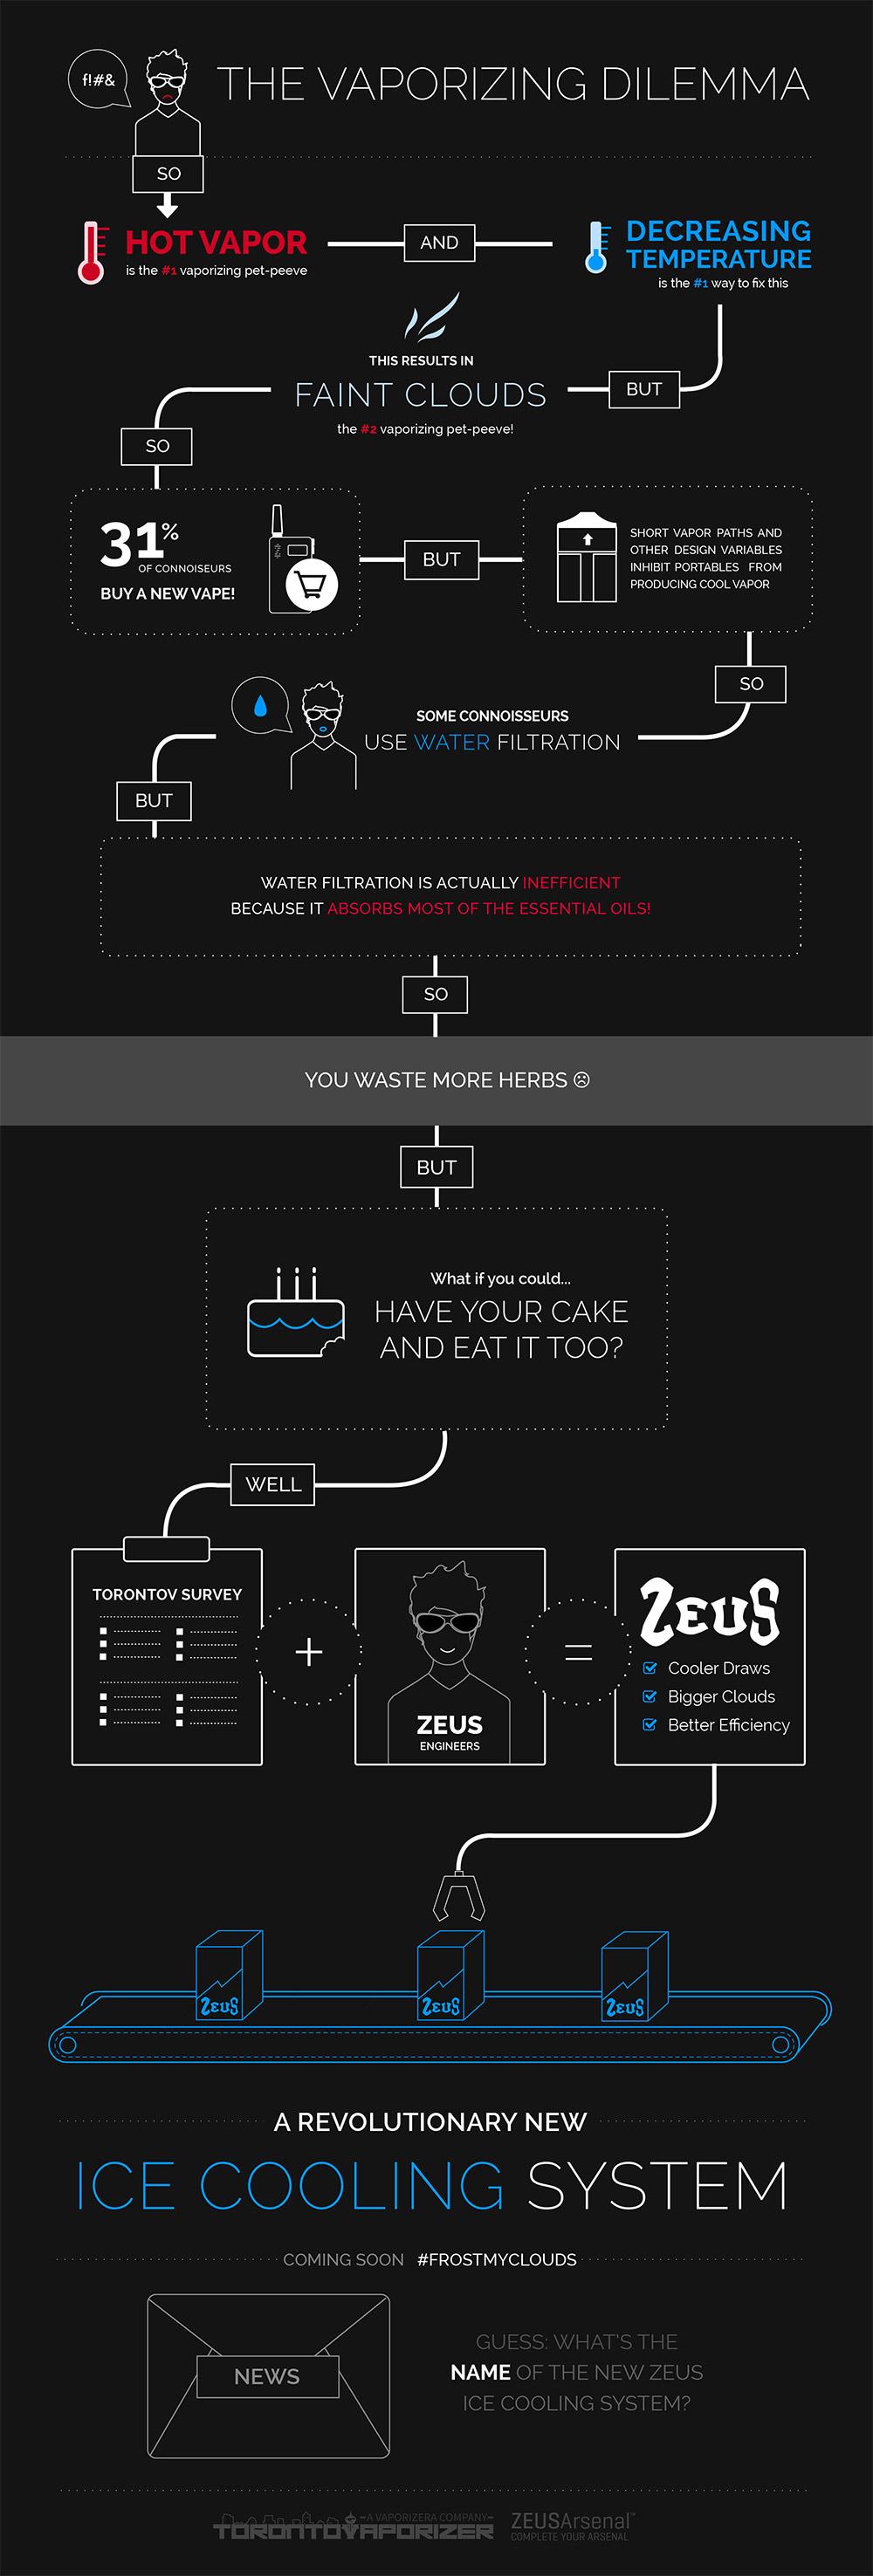 the-vaporizing-dilemma-infographic